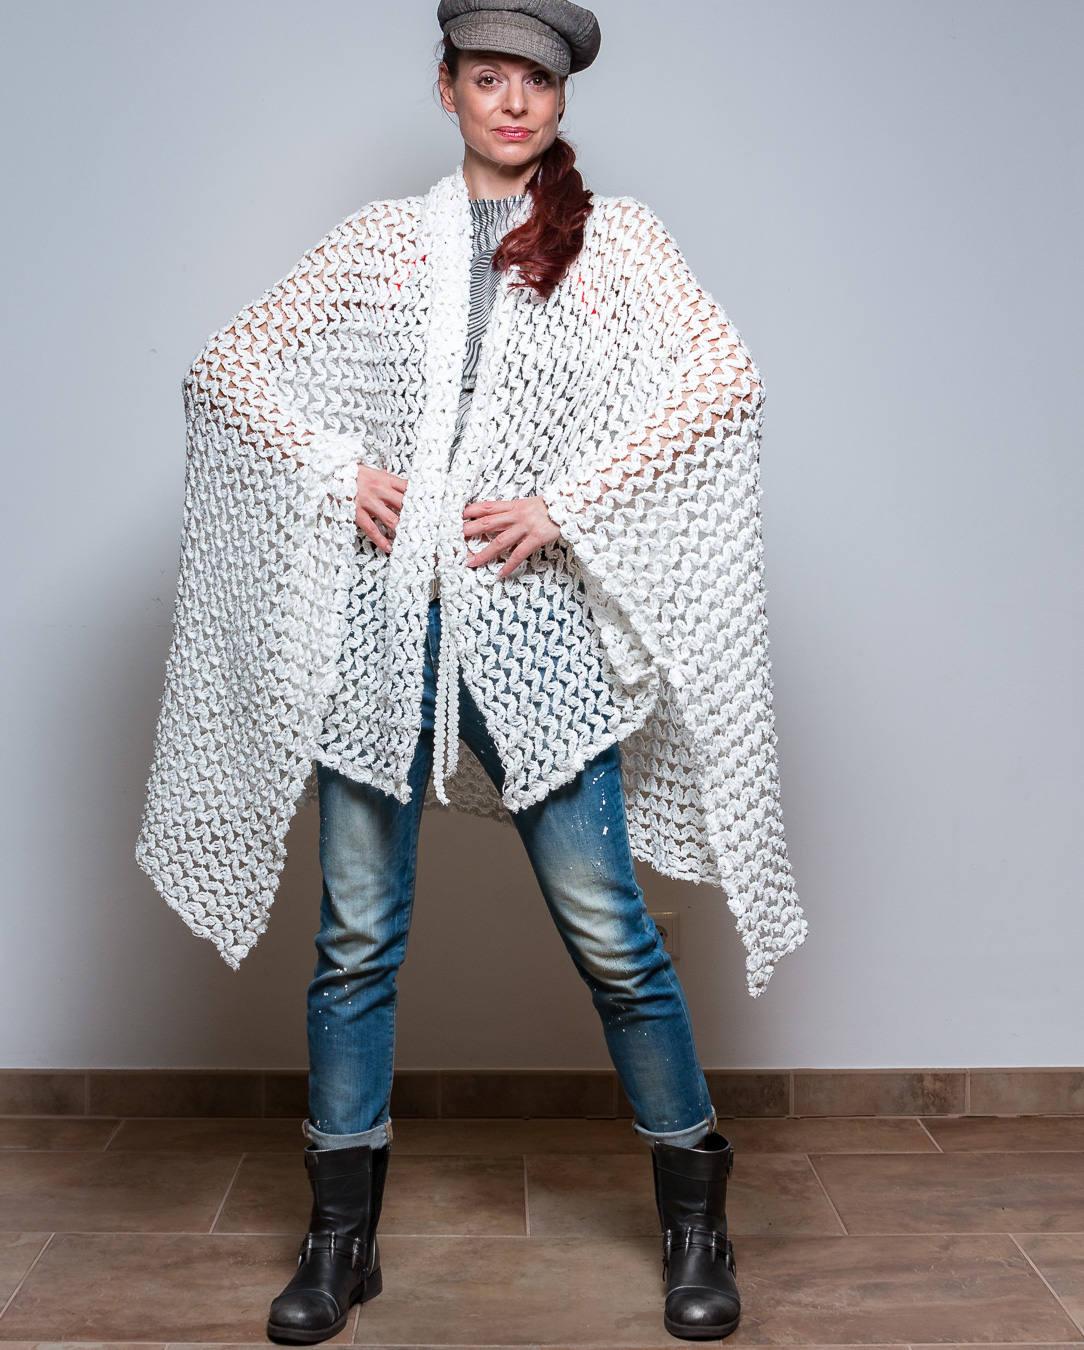 ROTETULPE Strickjacke Weiß Cardigan 5